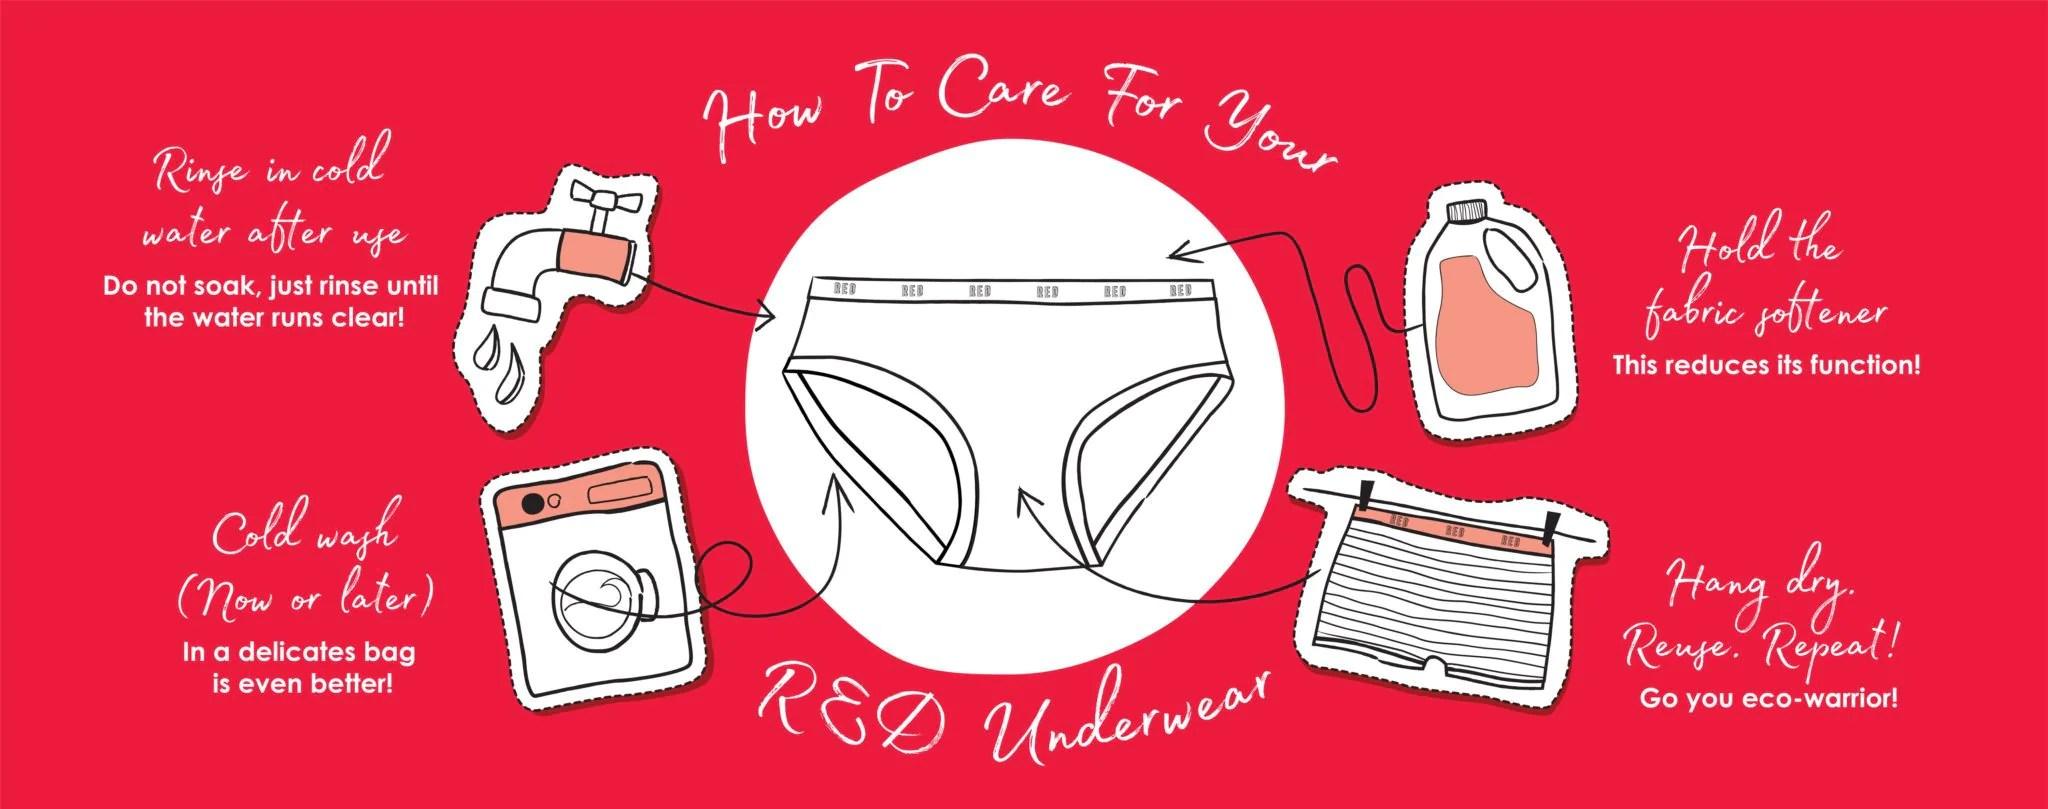 How Does Period Underwear Work? - Modibodi – Modibodi UK